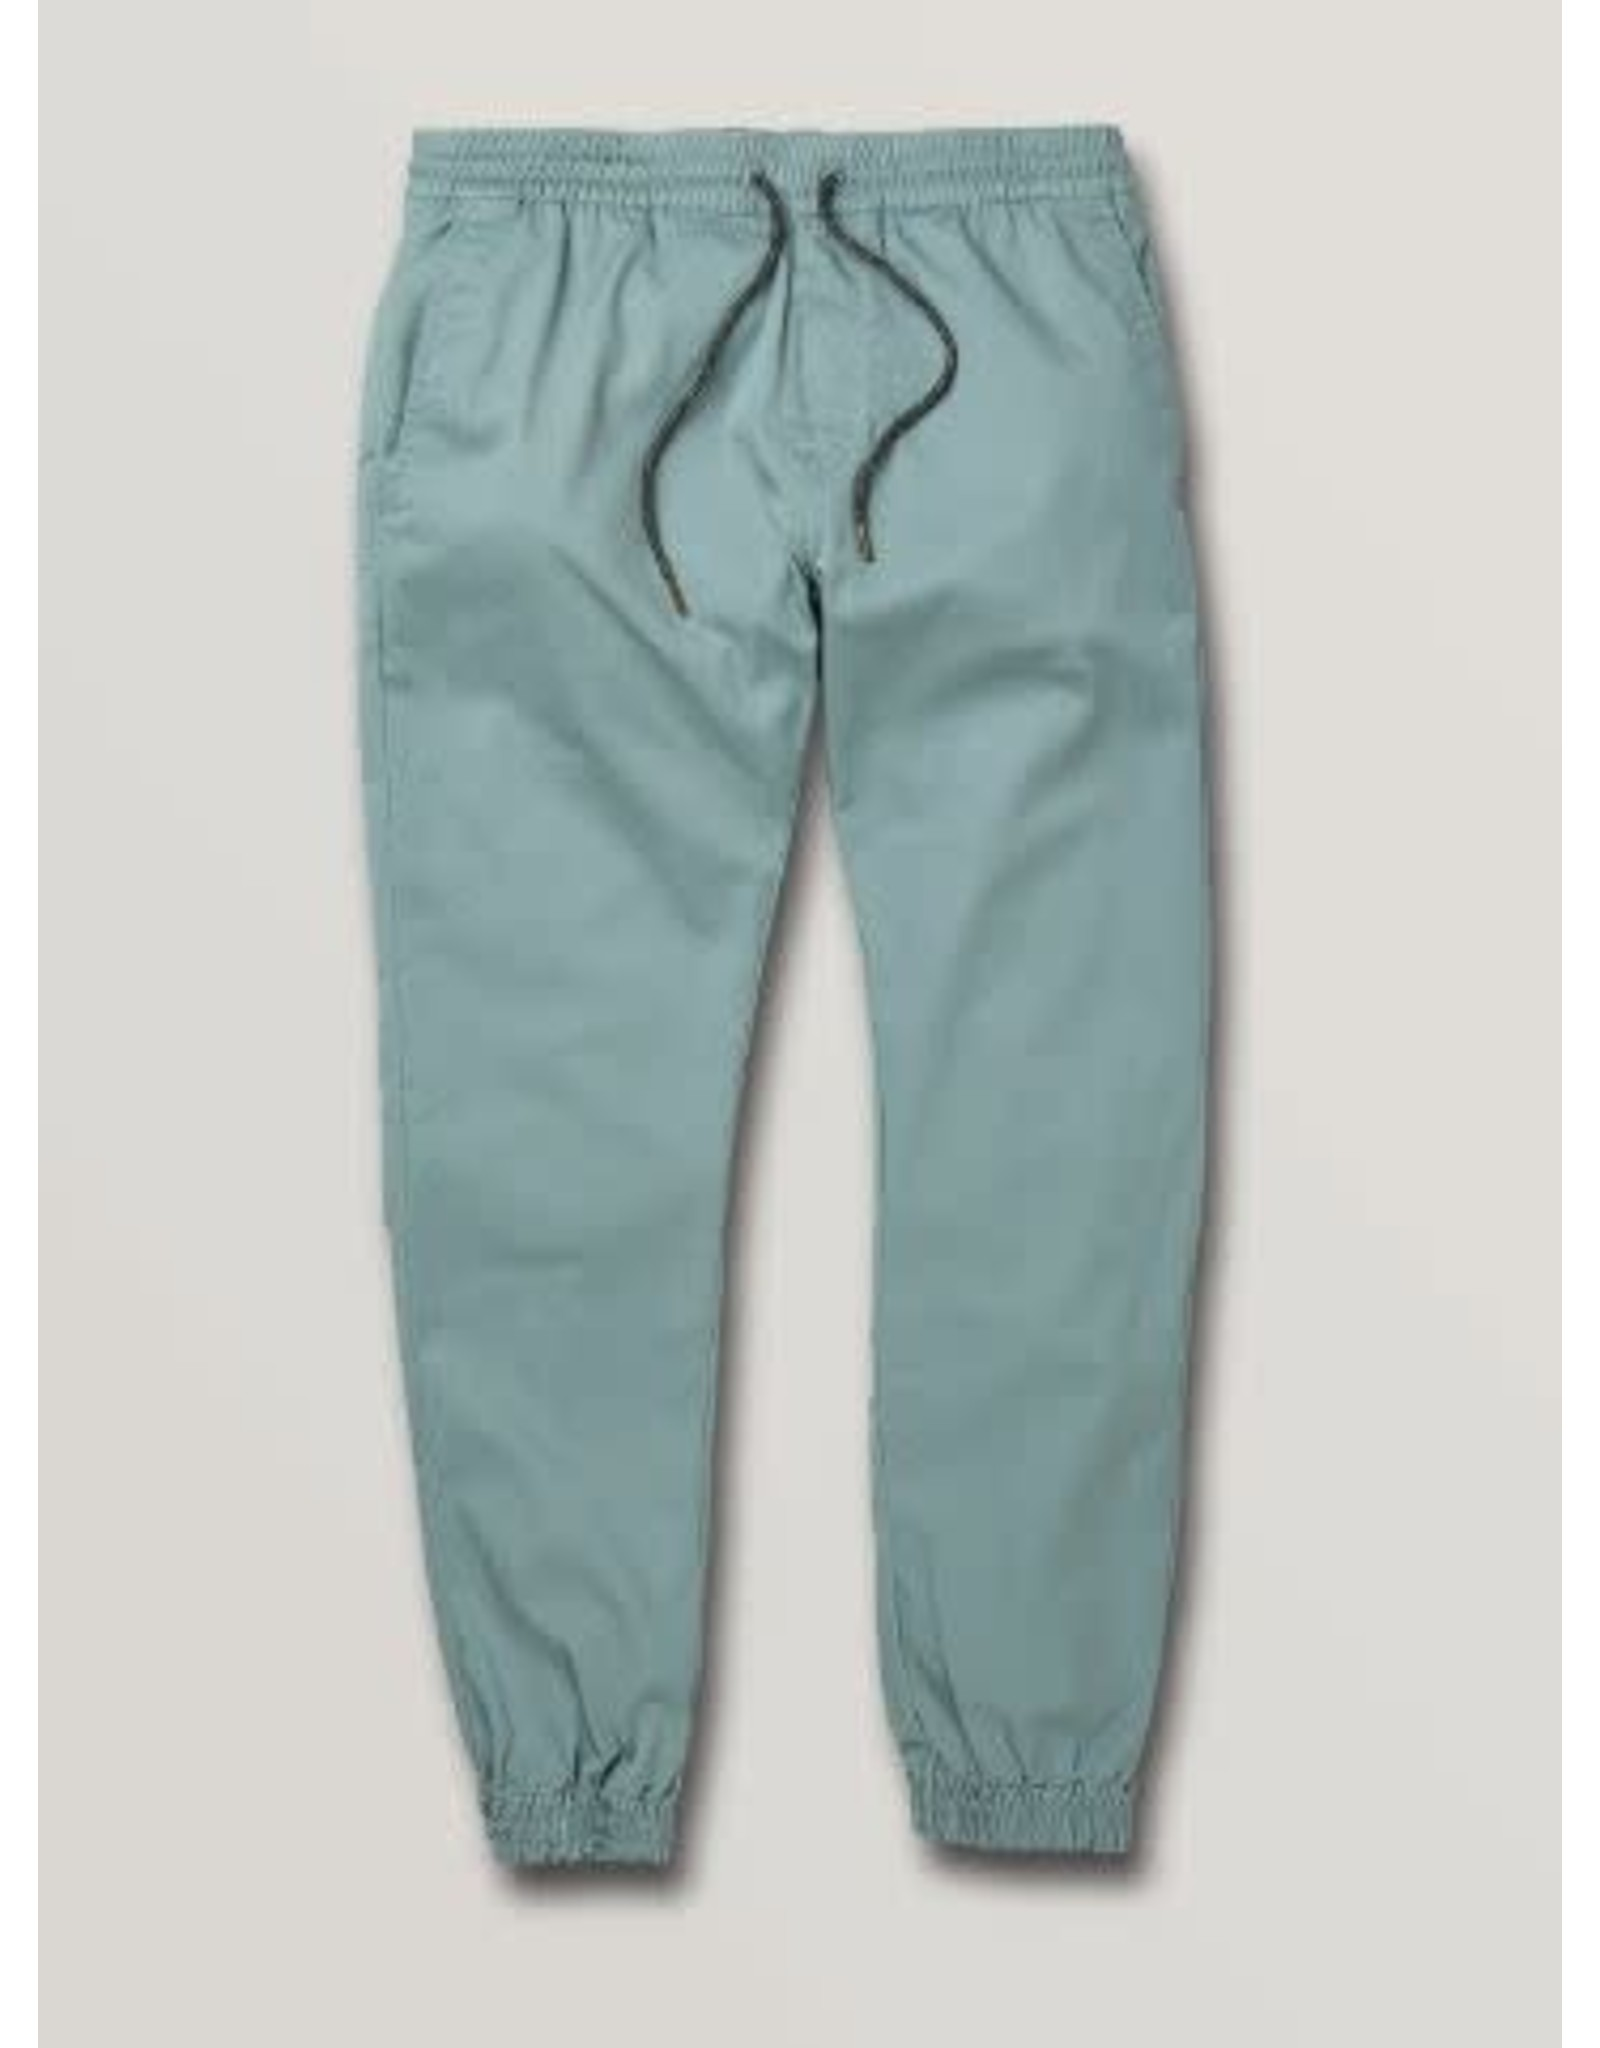 volcom Volcom - Pantalon Frickin Slim Jogger Cool Blue